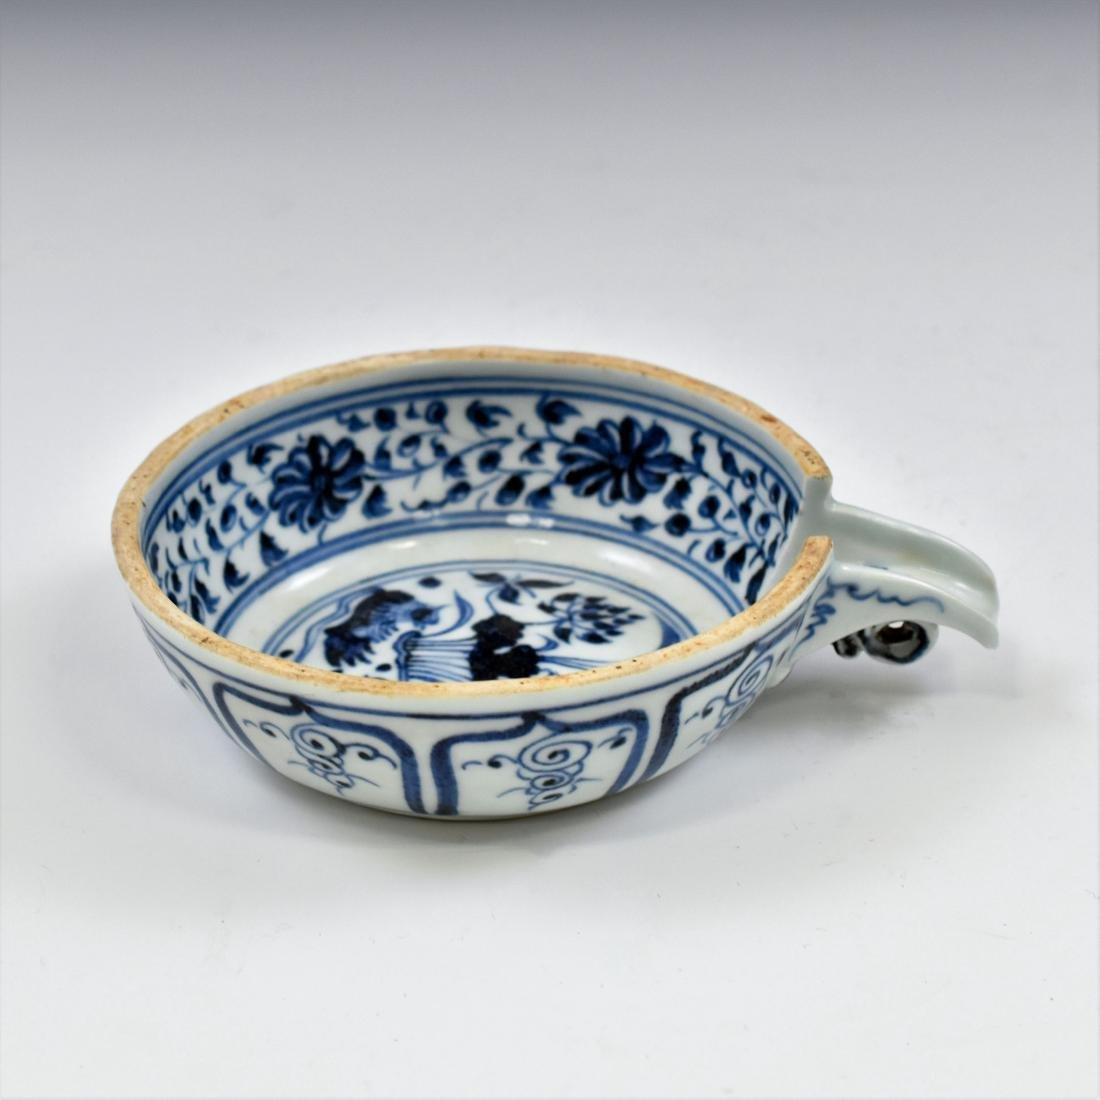 15 TH C YUAN DYNASTY BLUE & WHITE PORCELAIN WATER - 2